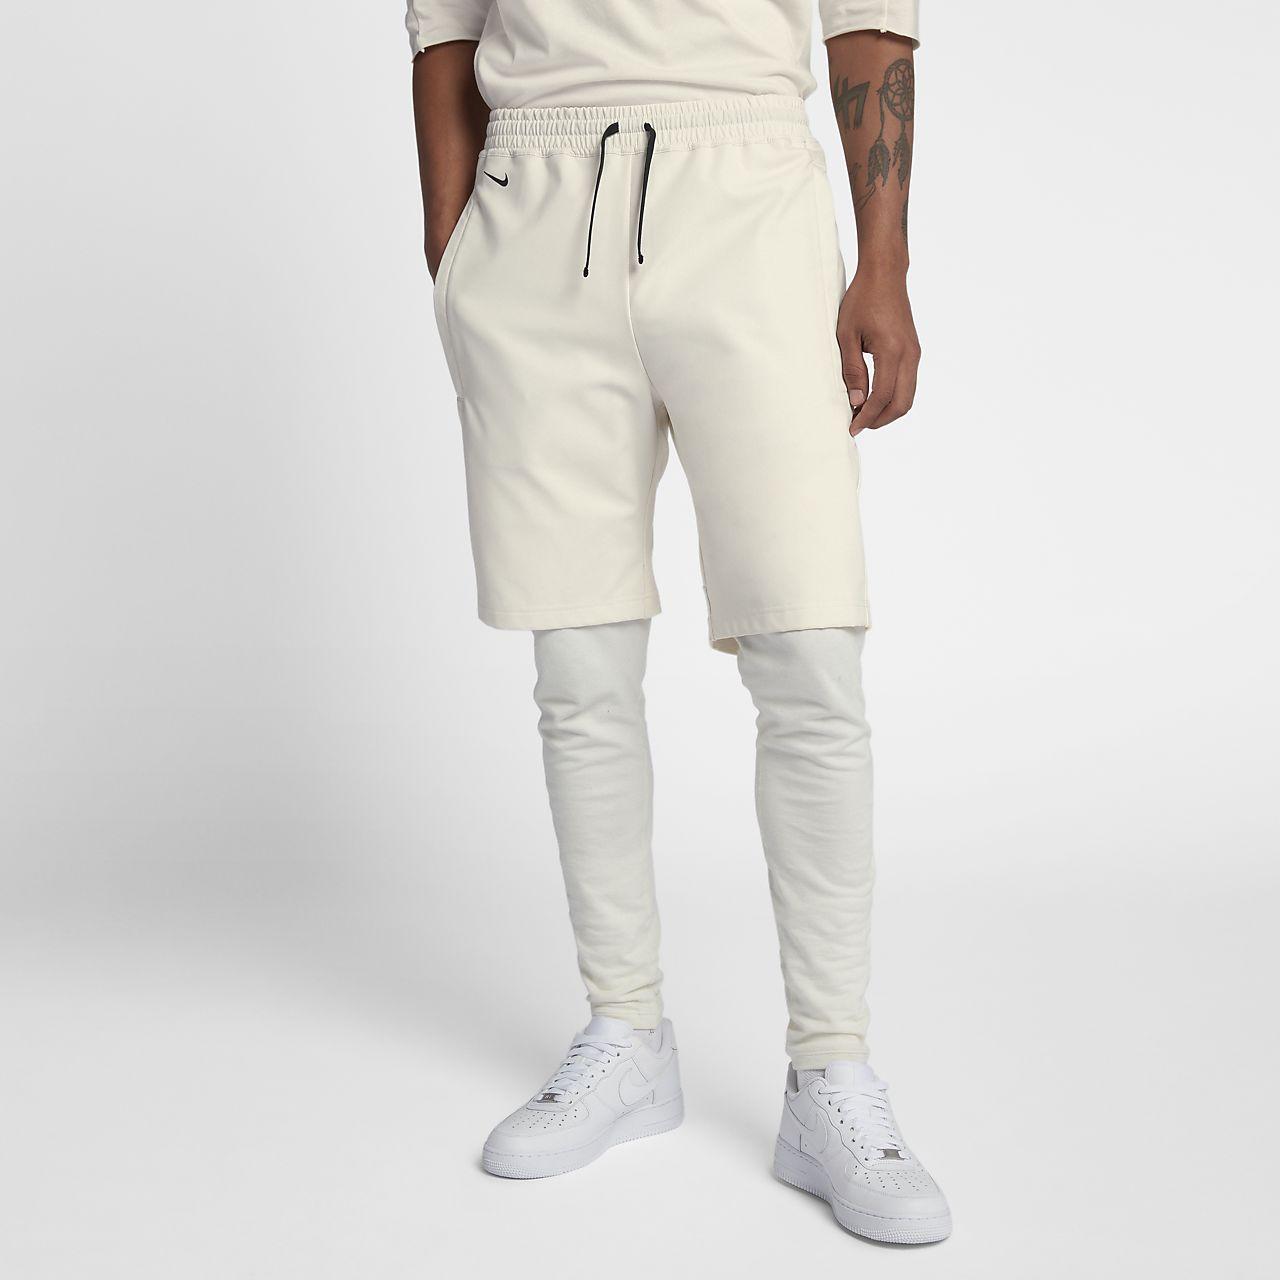 Spodenki męskie Nike AAE 2.0